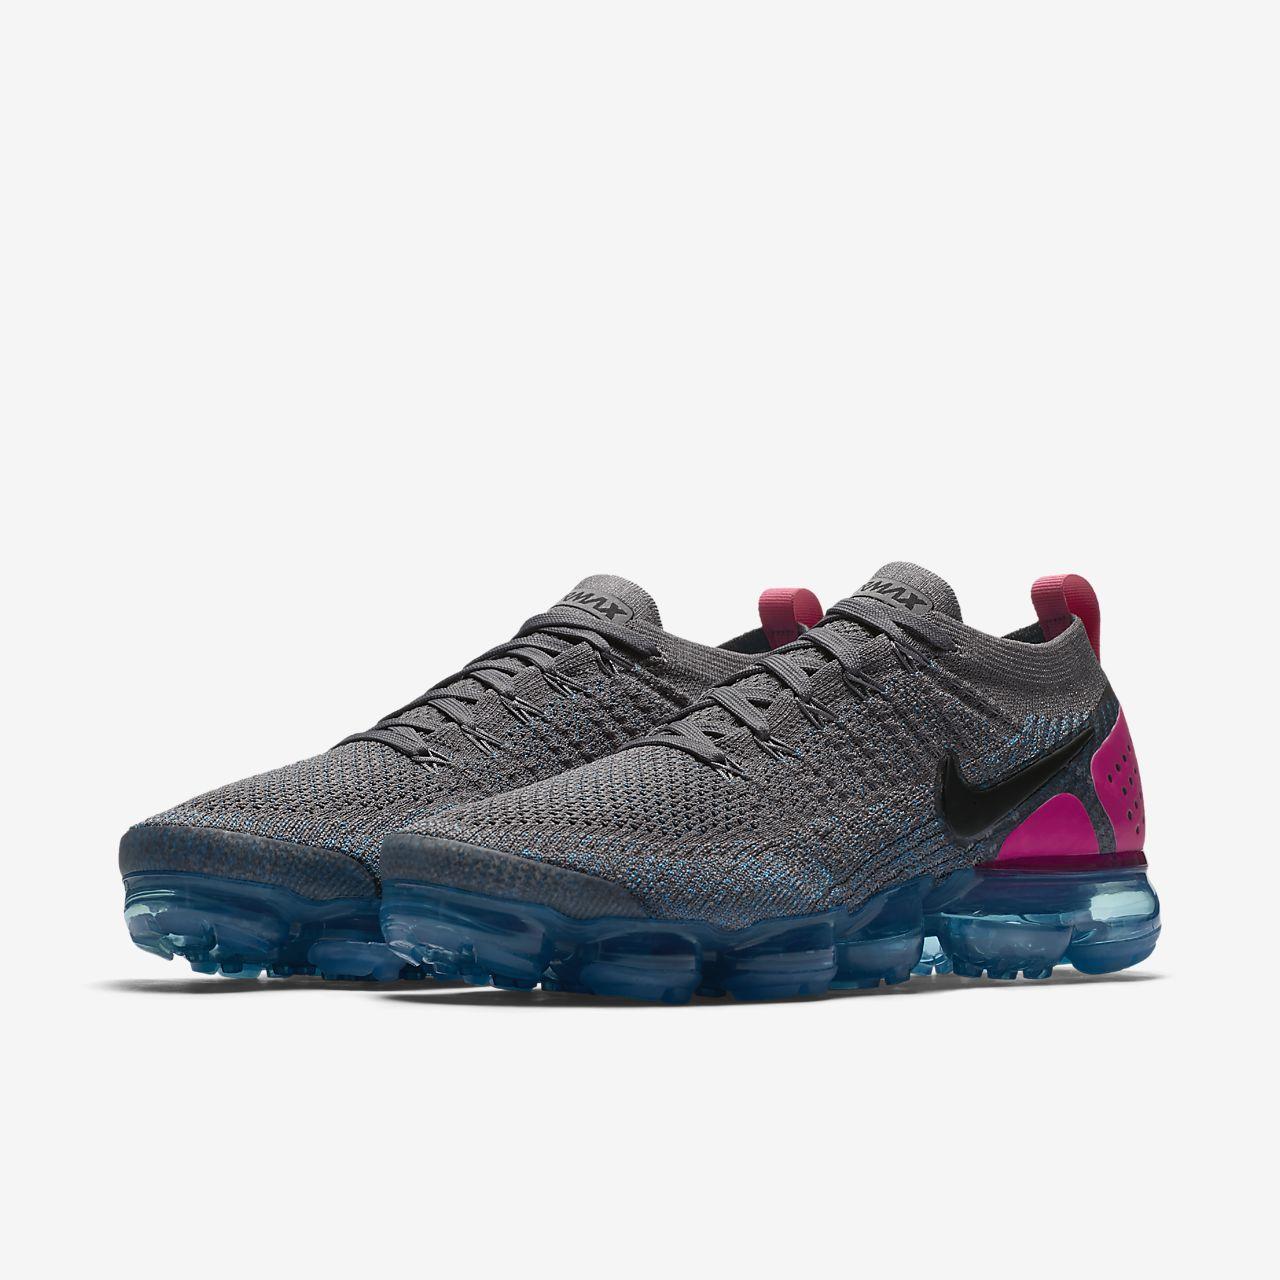 online retailer d8fcd e5429 Nike Air VaporMax Flyknit 2018.5 Triple Black Men's Running ...